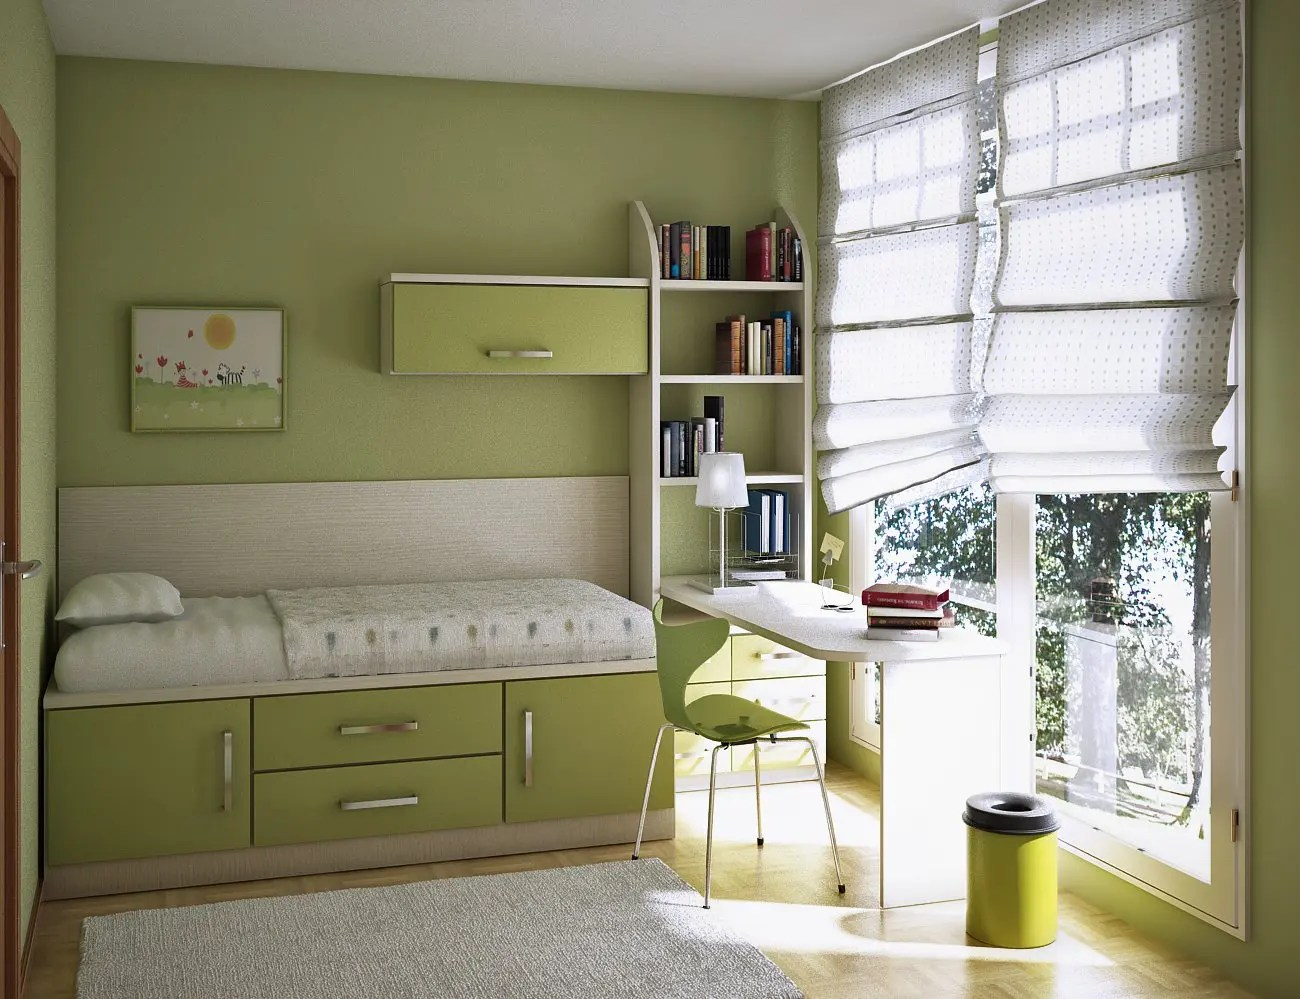 17 Cool Teen Room Ideas - DigsDigs on Teenage Rooms  id=31350